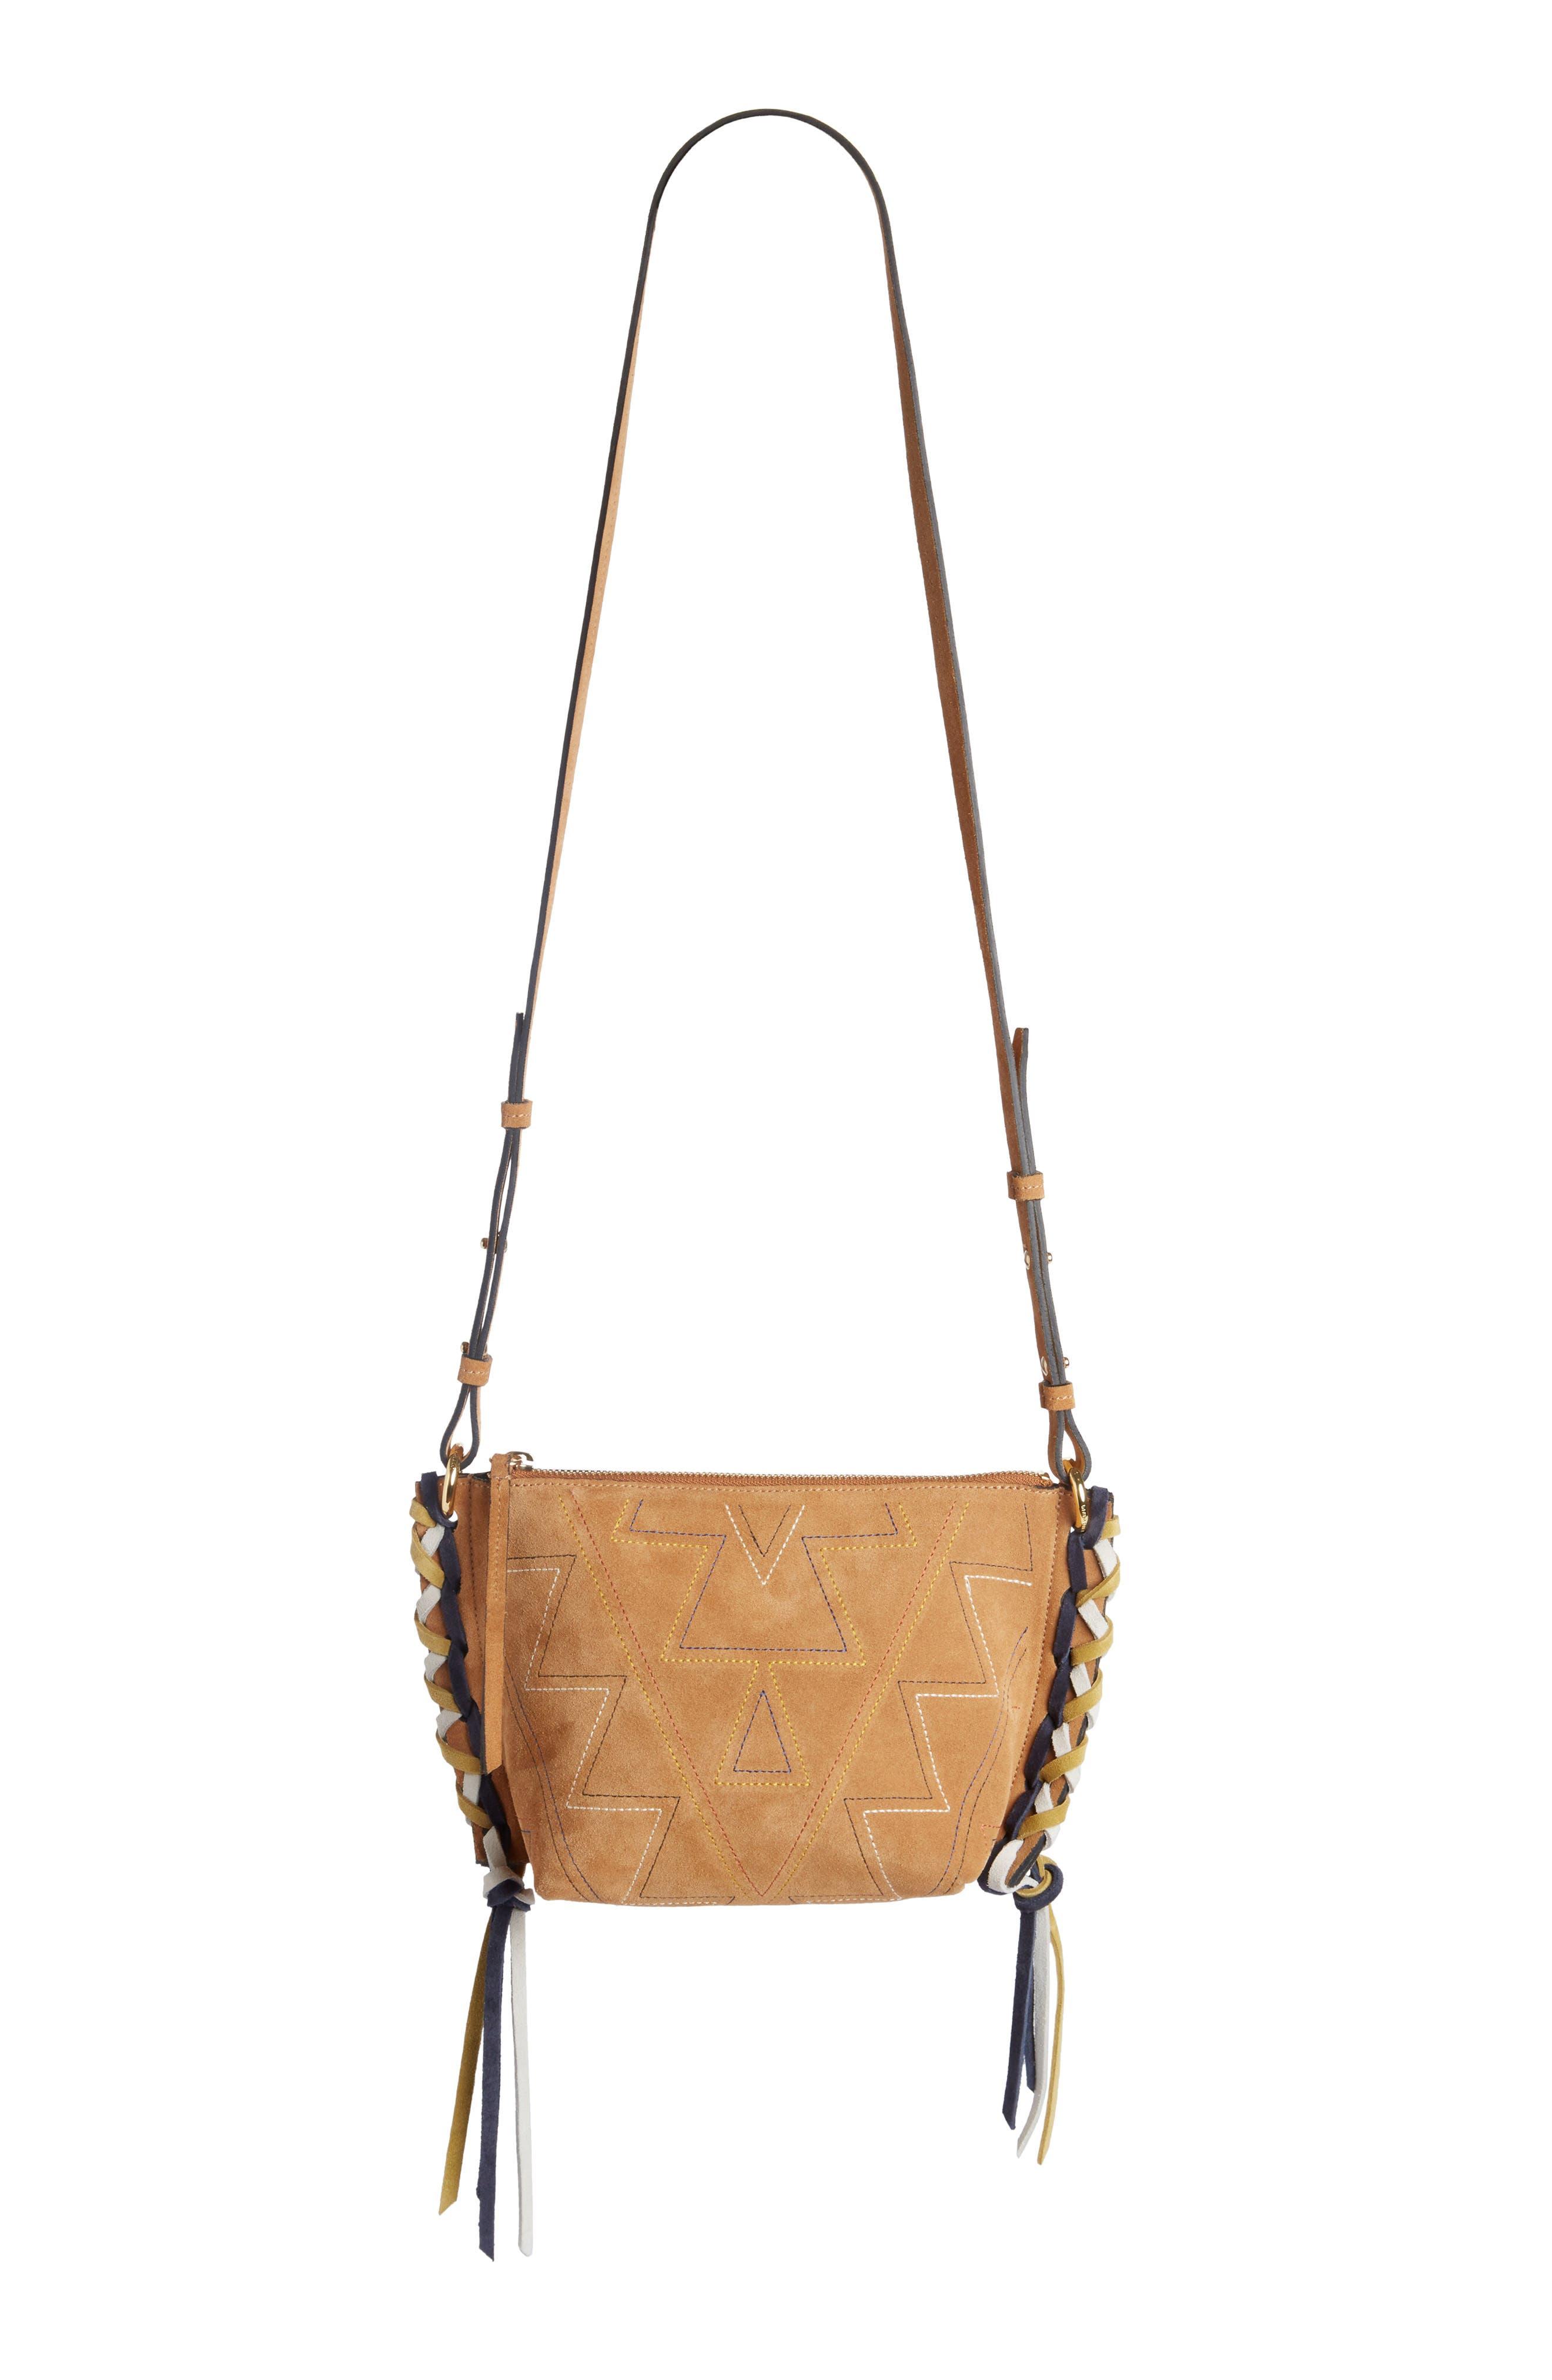 Fangoh Stitched Suede Crossbody Bag,                             Main thumbnail 1, color,                             210